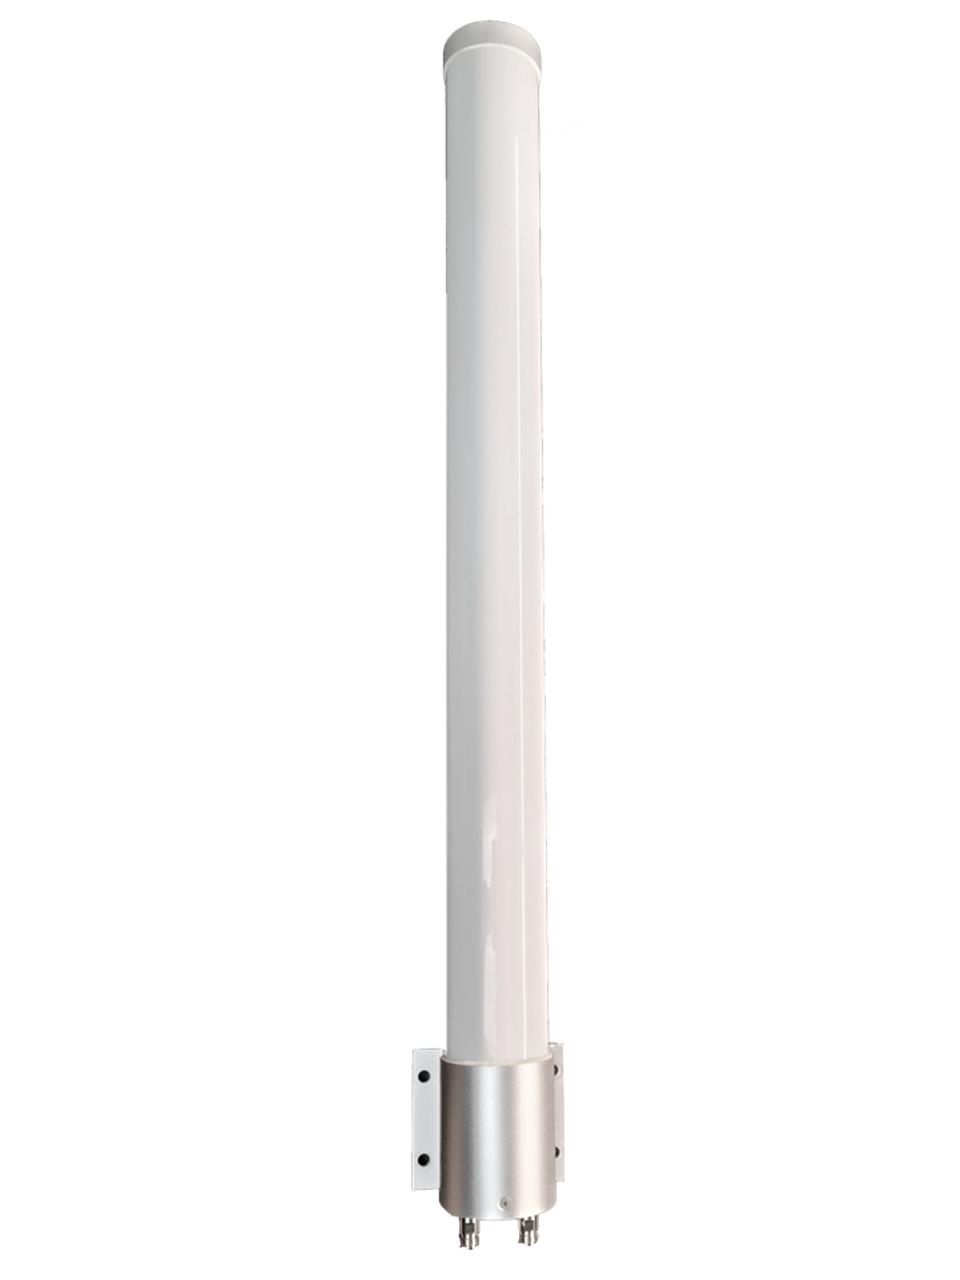 M39 Omni Directional MIMO 2 x Cellular 4G 5G LTE Antenna for NETGEAR NIGHTHAWK AX4 w/Bracket Mount - 2 x N Female w/Cable Length Options.